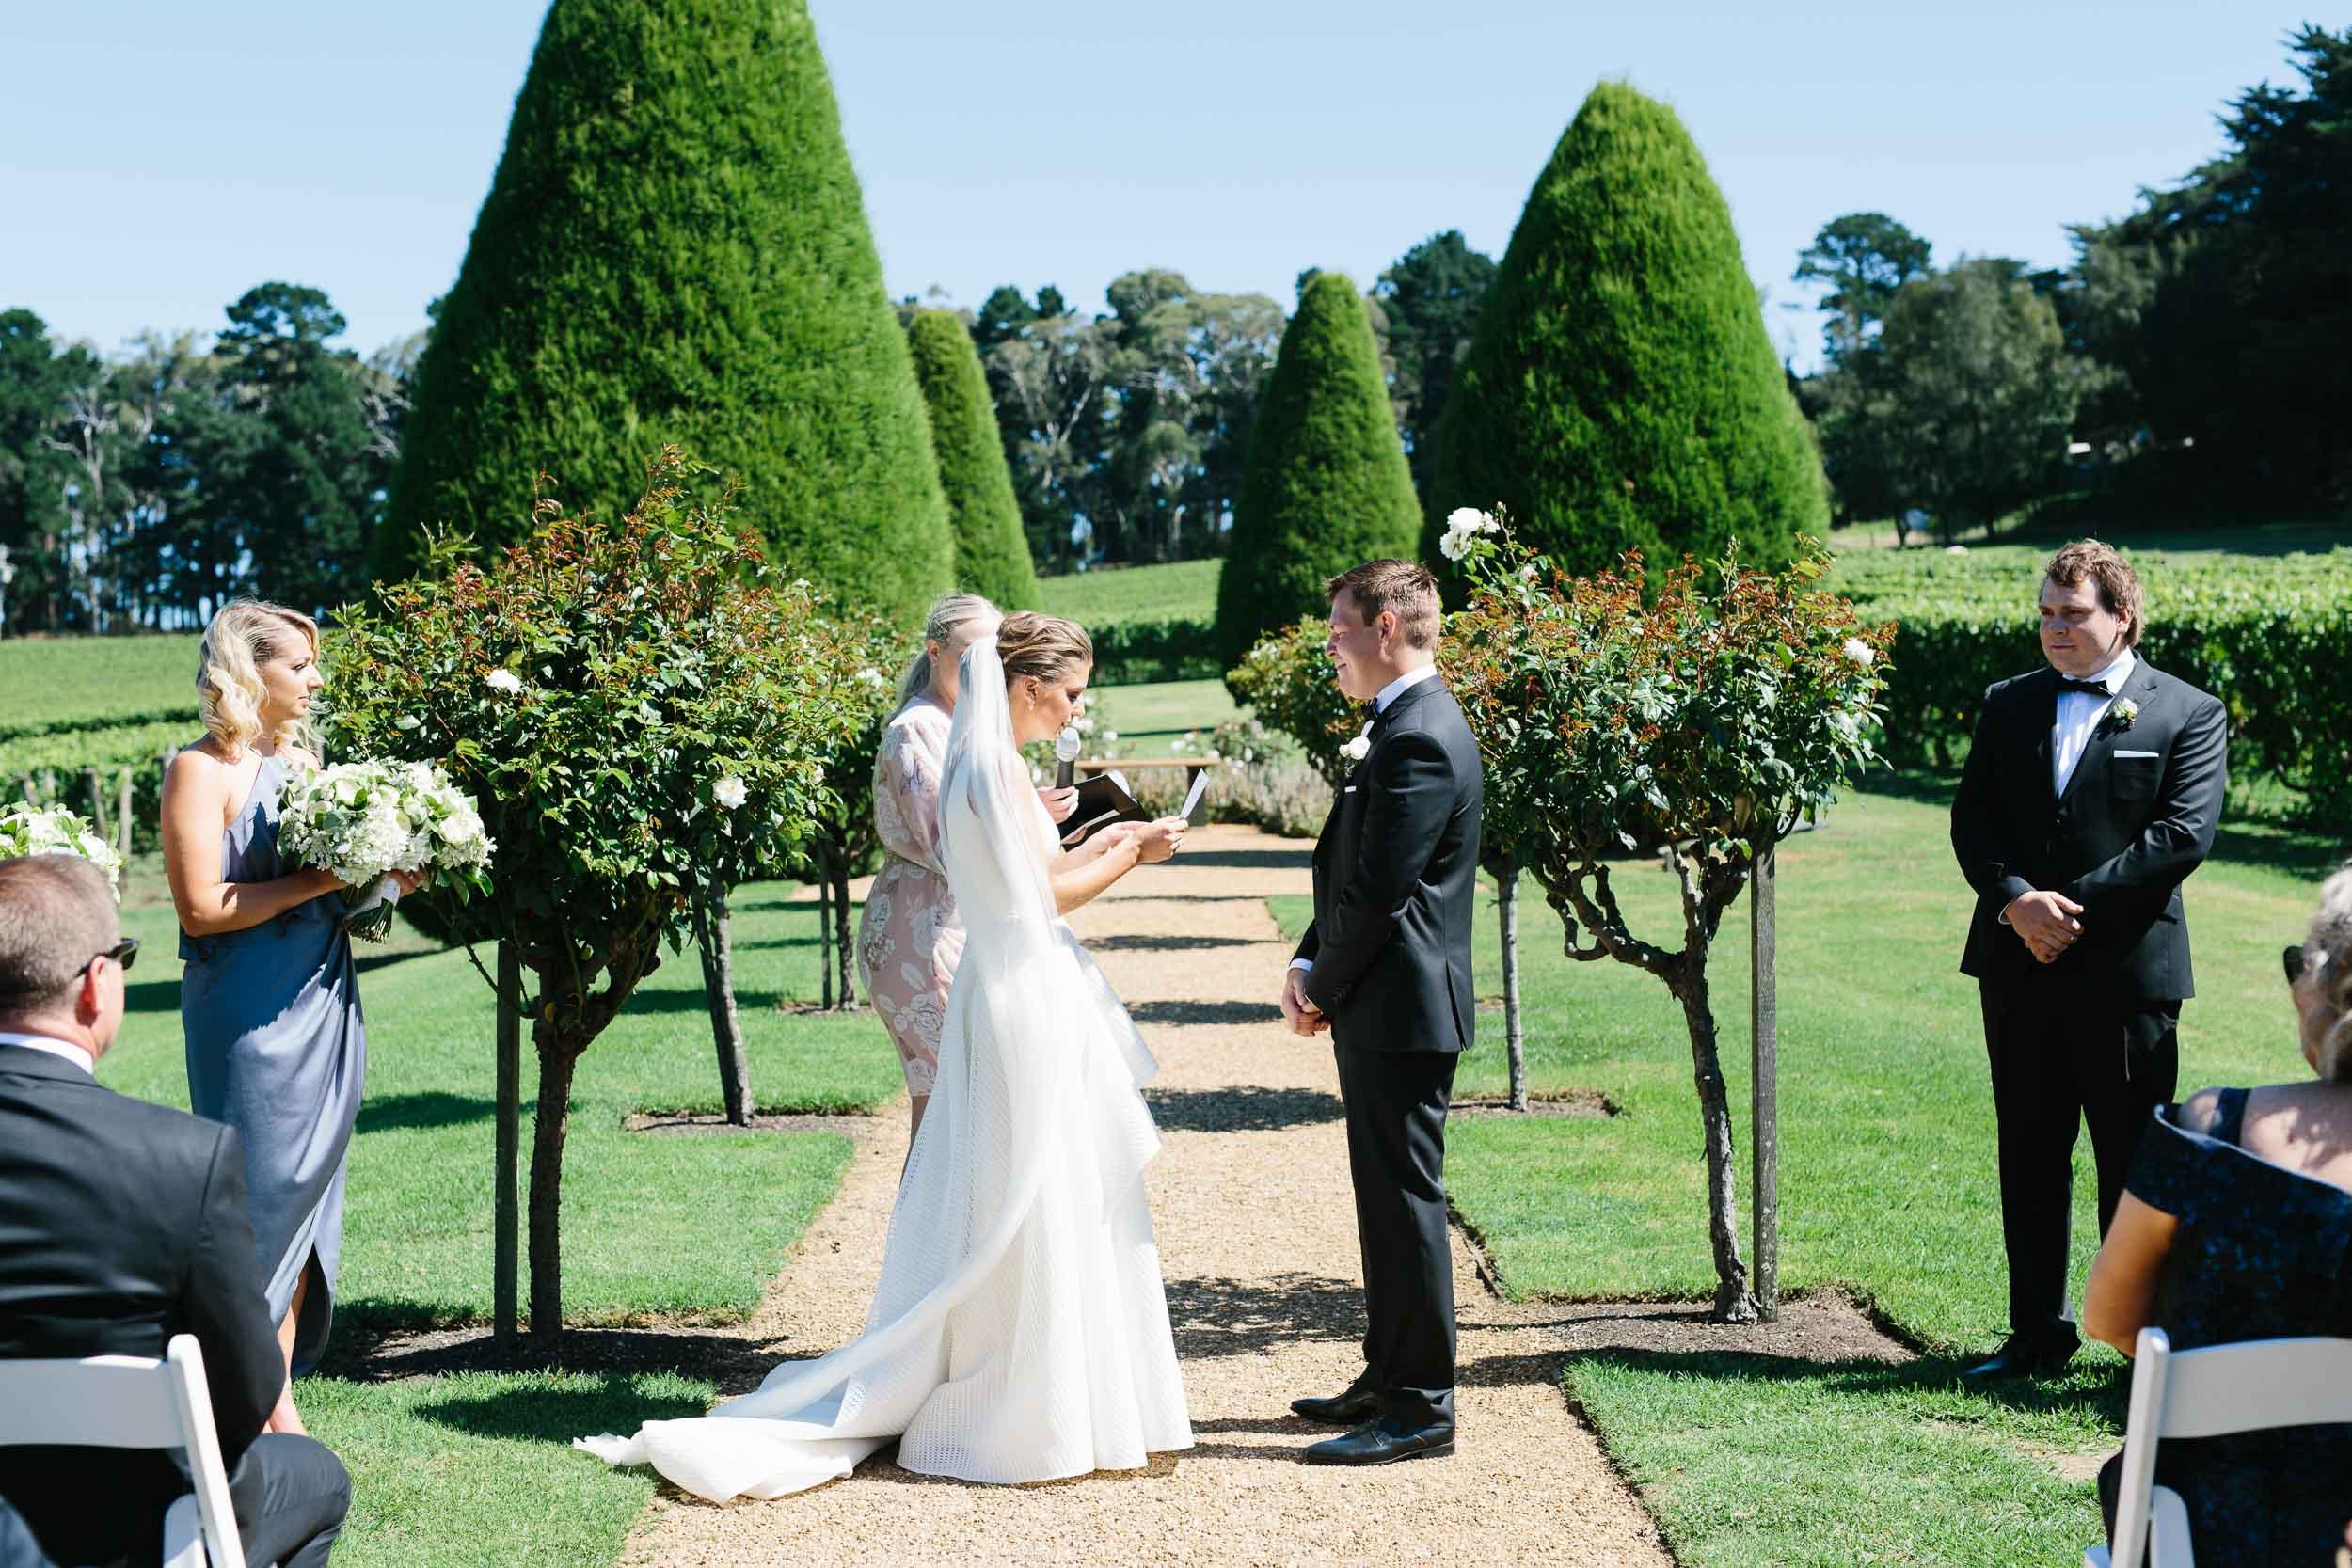 Kas-Richards-Mornington-Peninsula-Wedding-Lindenderry-Red-Hill-252.jpg